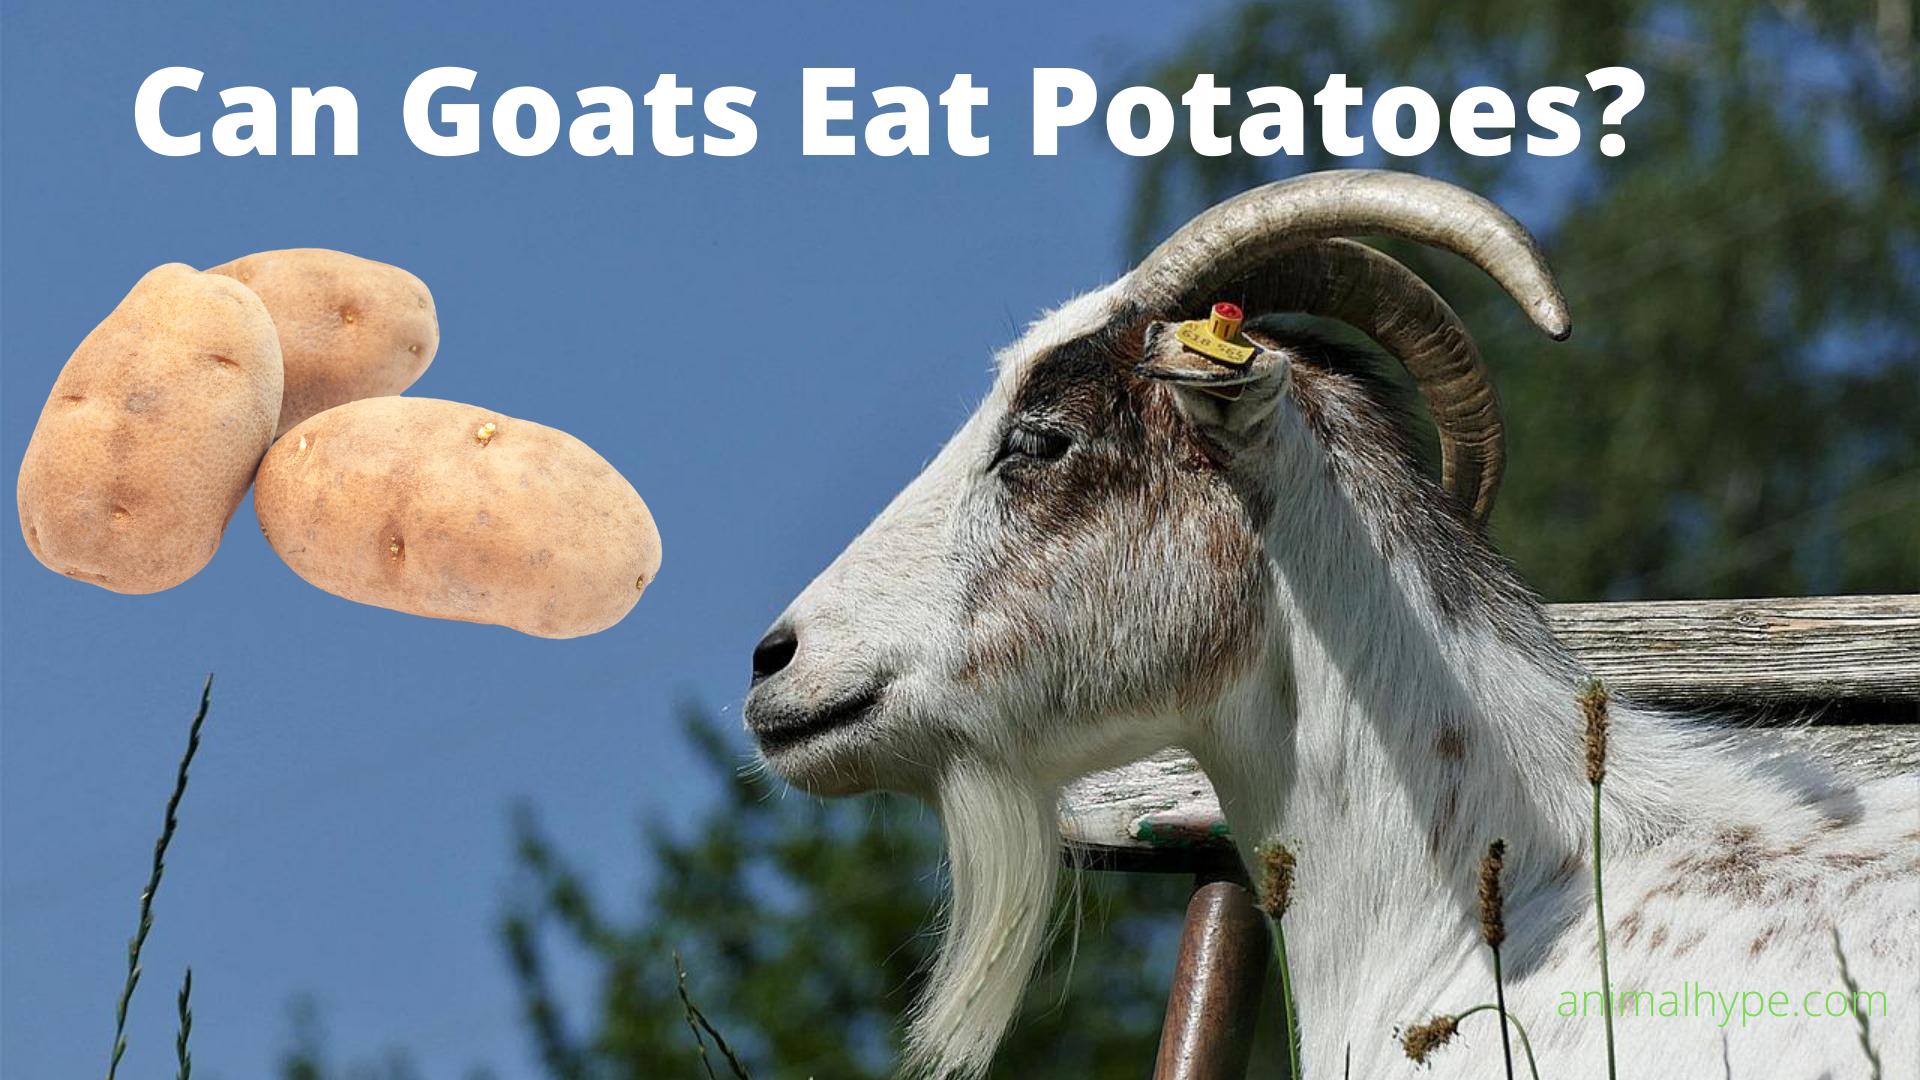 Can Goats Eat Potatoes